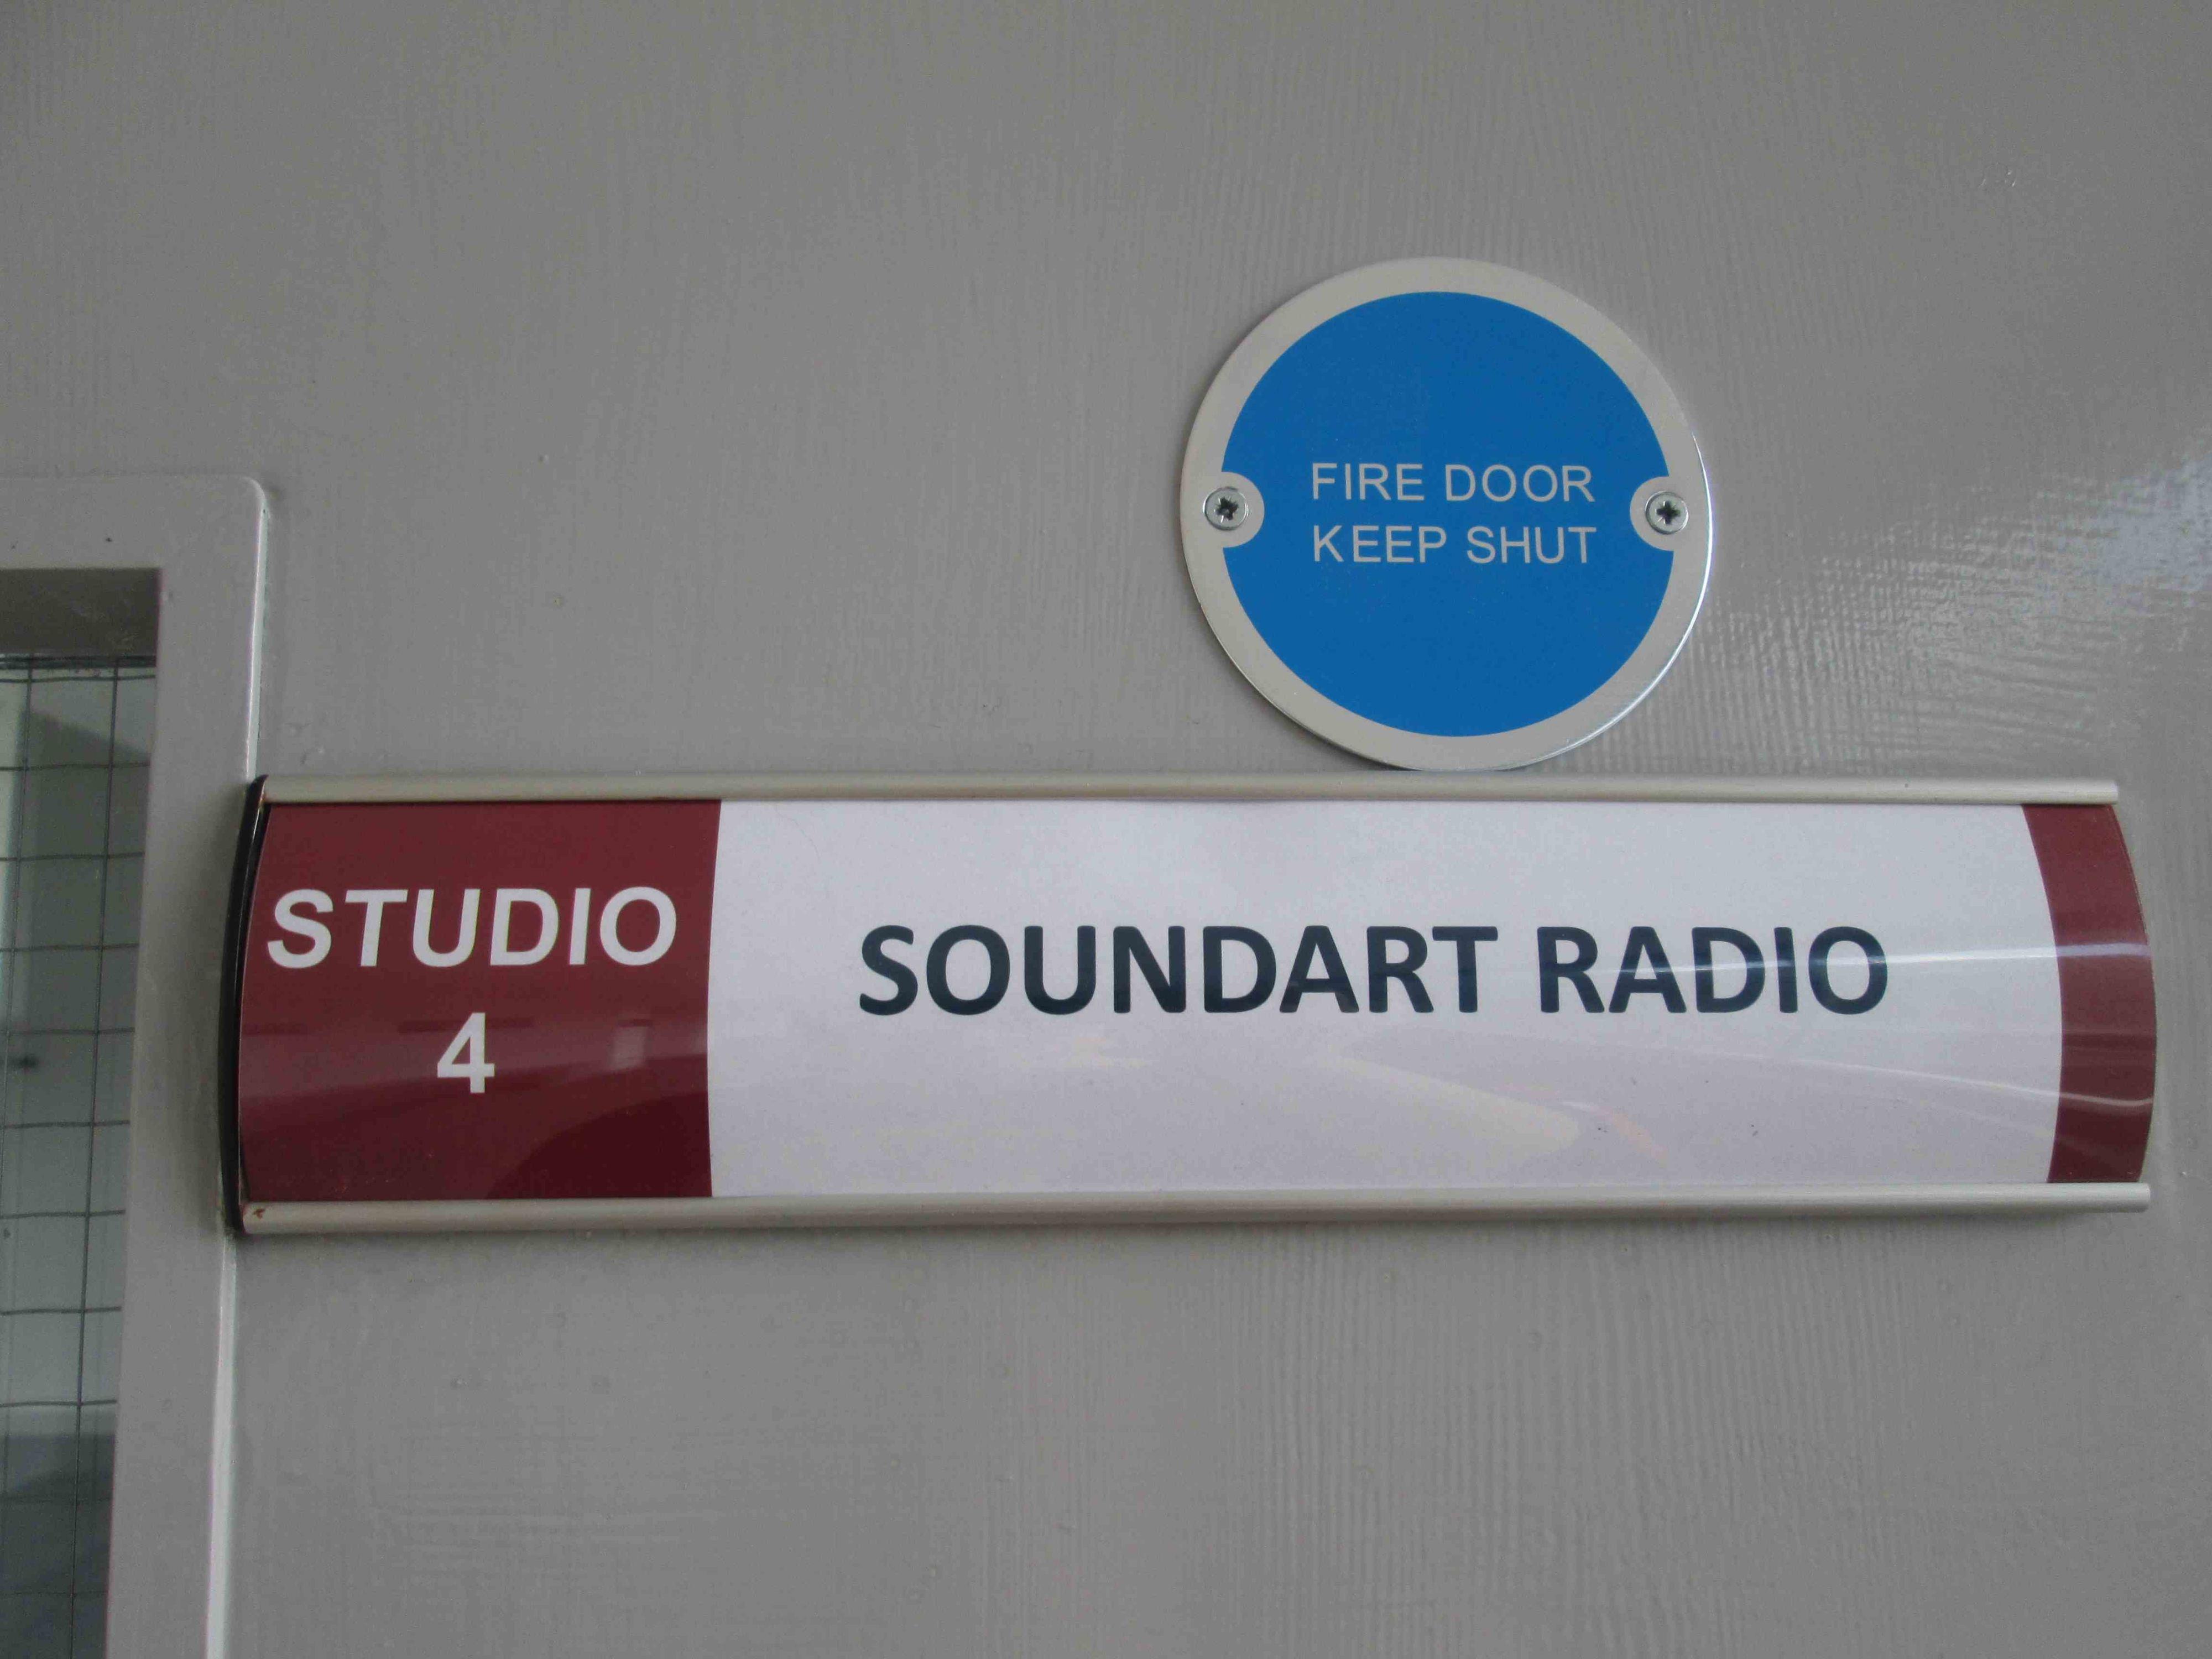 Soundart Radio 102.5 FM :